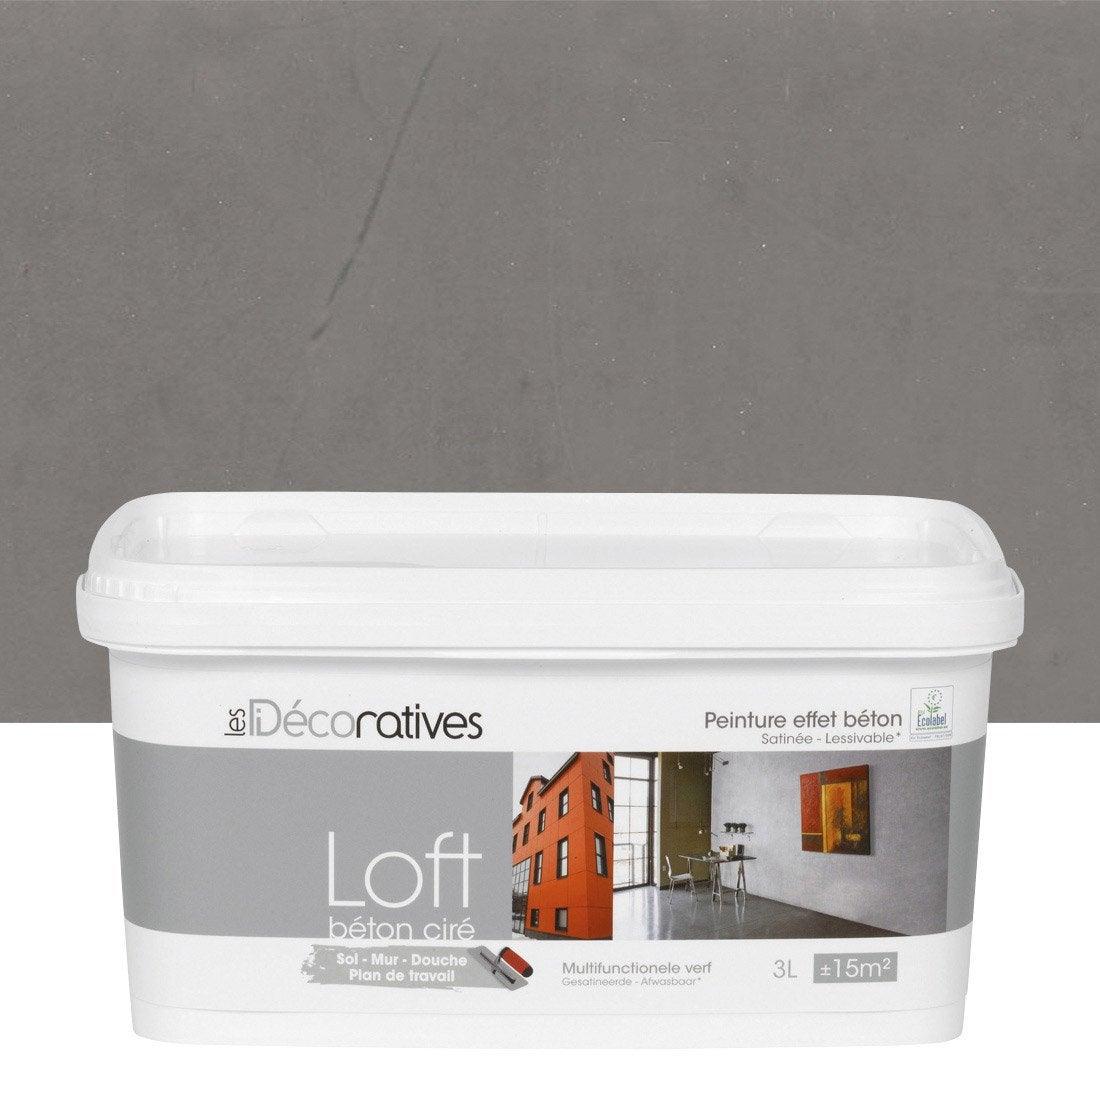 leroymerlin.fr/multimedia/cf1400491984/produits/peinture-a-effet-loft-beton-cire-les-decoratives-gris-plomb-3-l